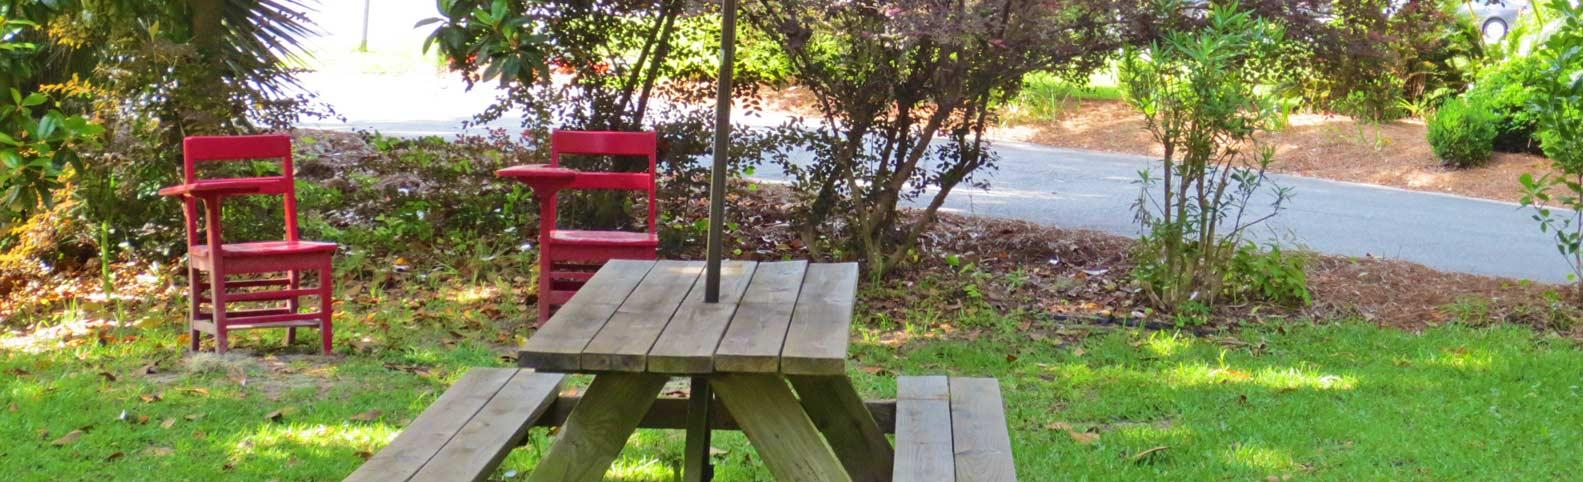 Childrens-Garden-picnic-table